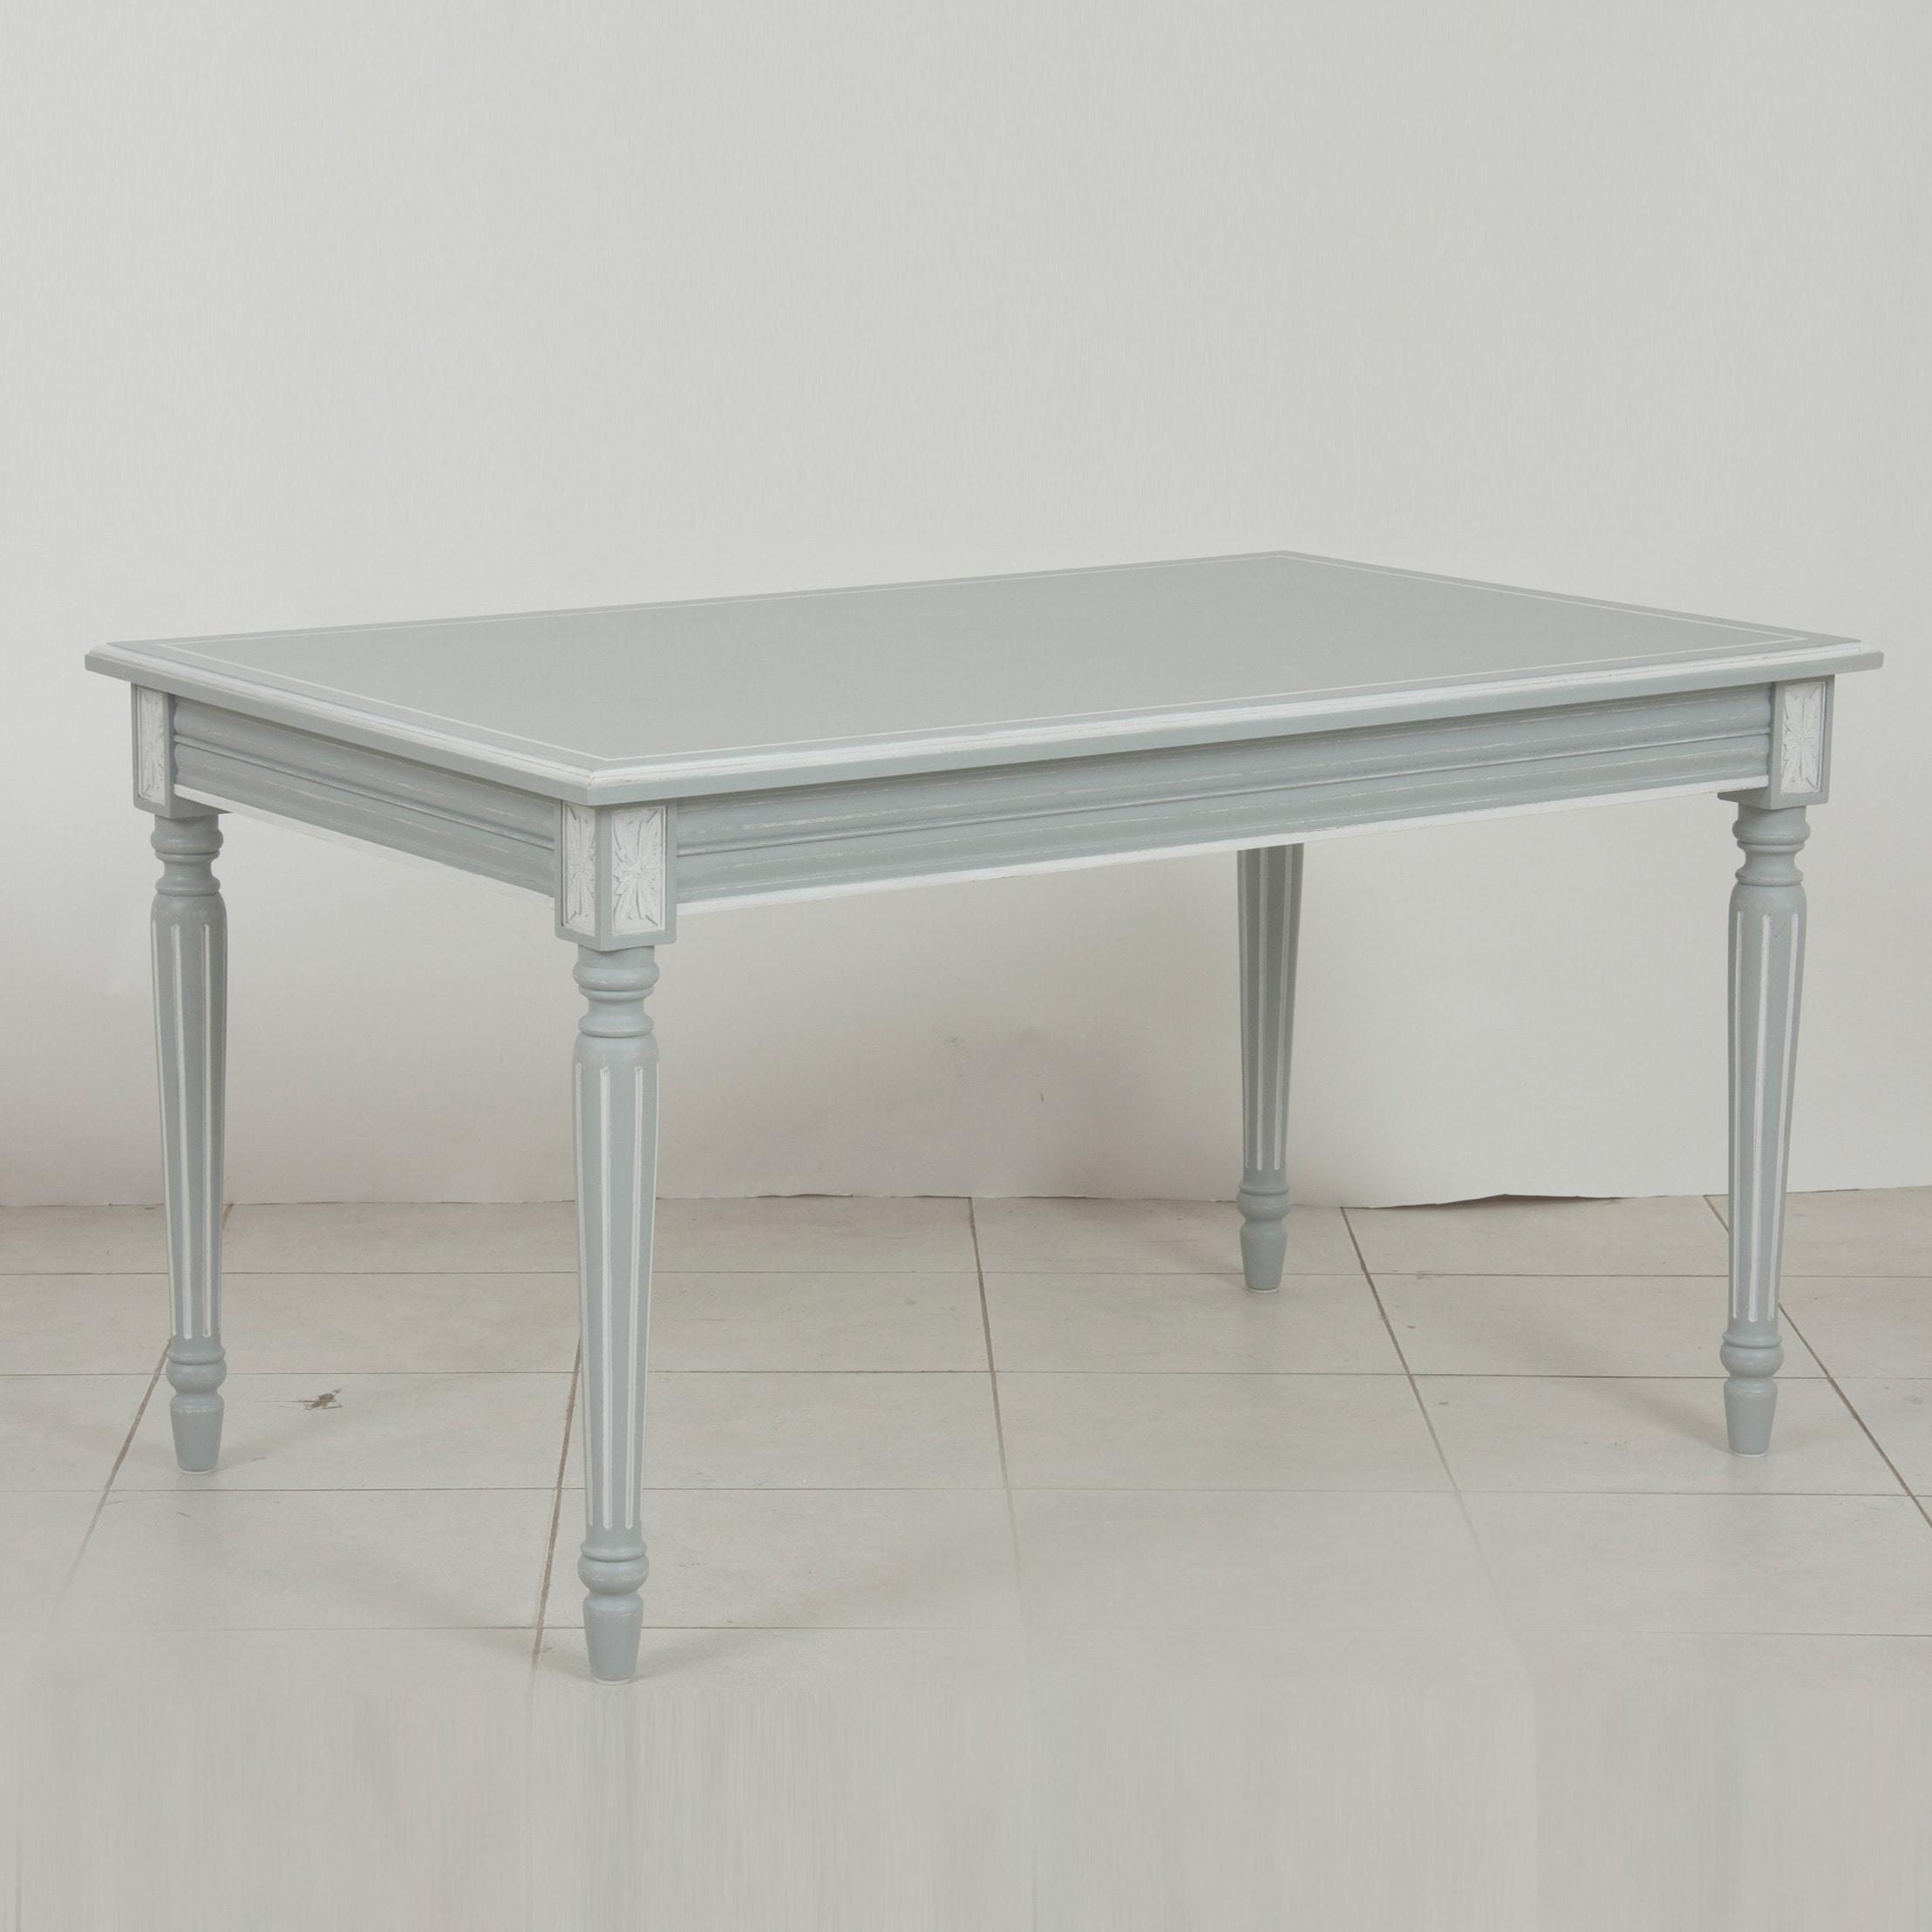 [INT] 원목 주방 프렌치 프로방스 웨일즈 1350 4인 식탁 테이블